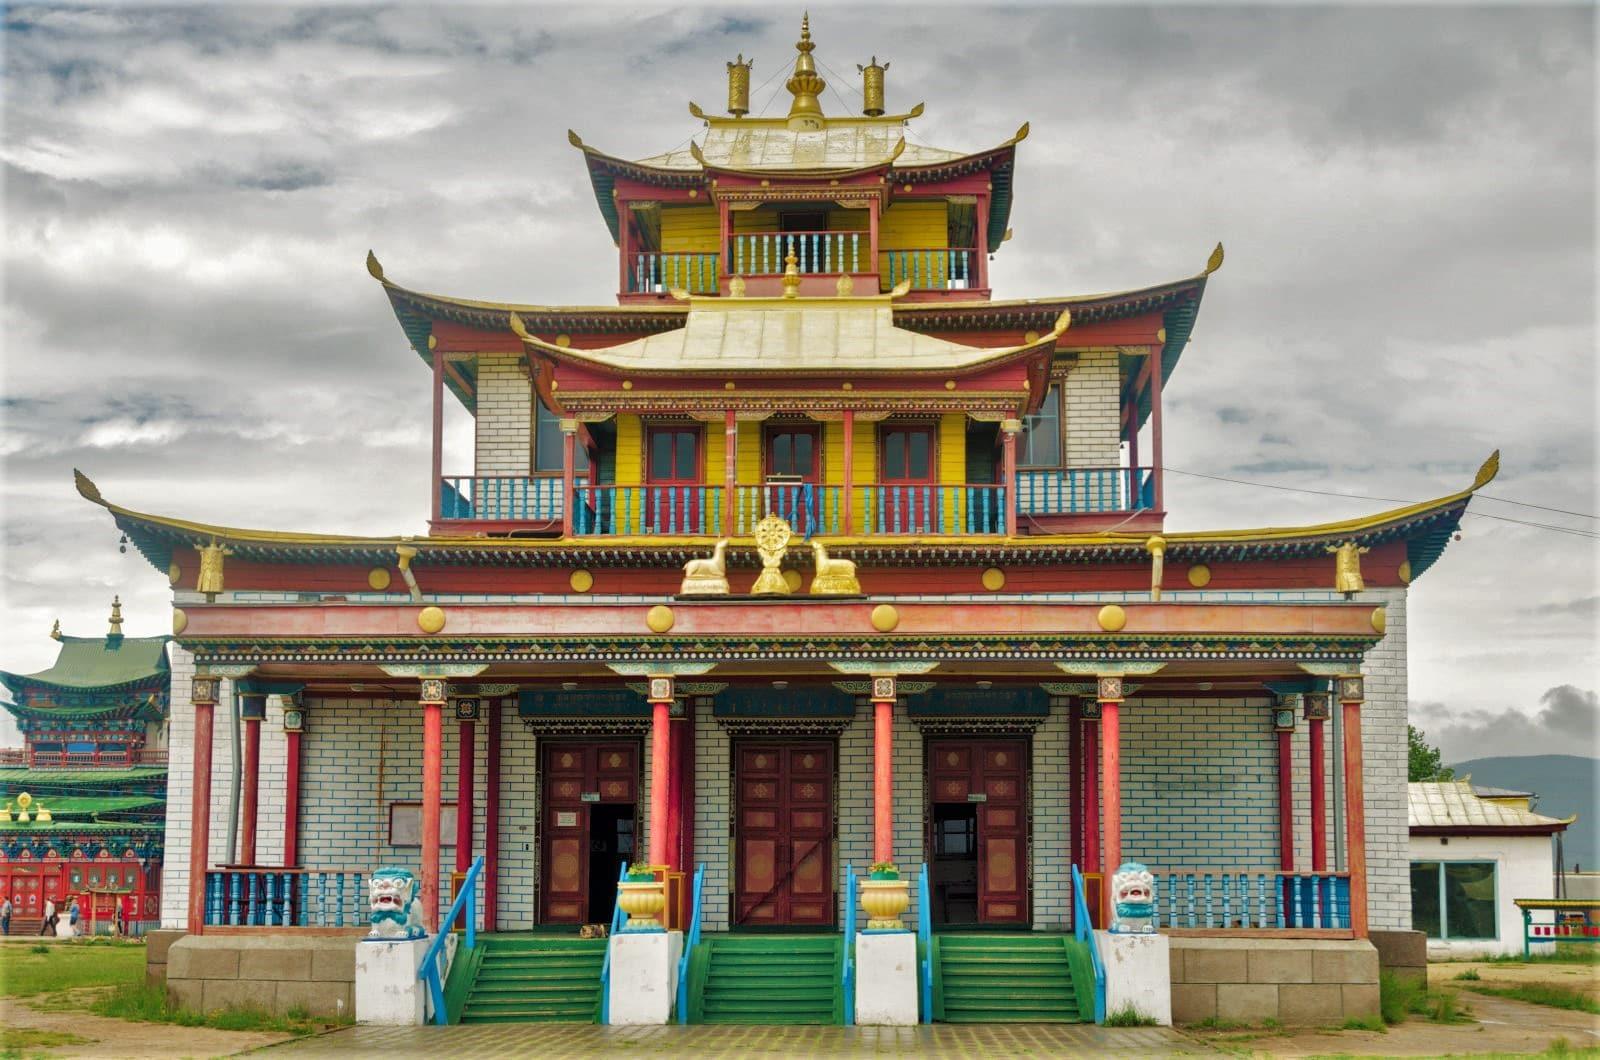 Datsan, Buddhist temple in Ulan Ude